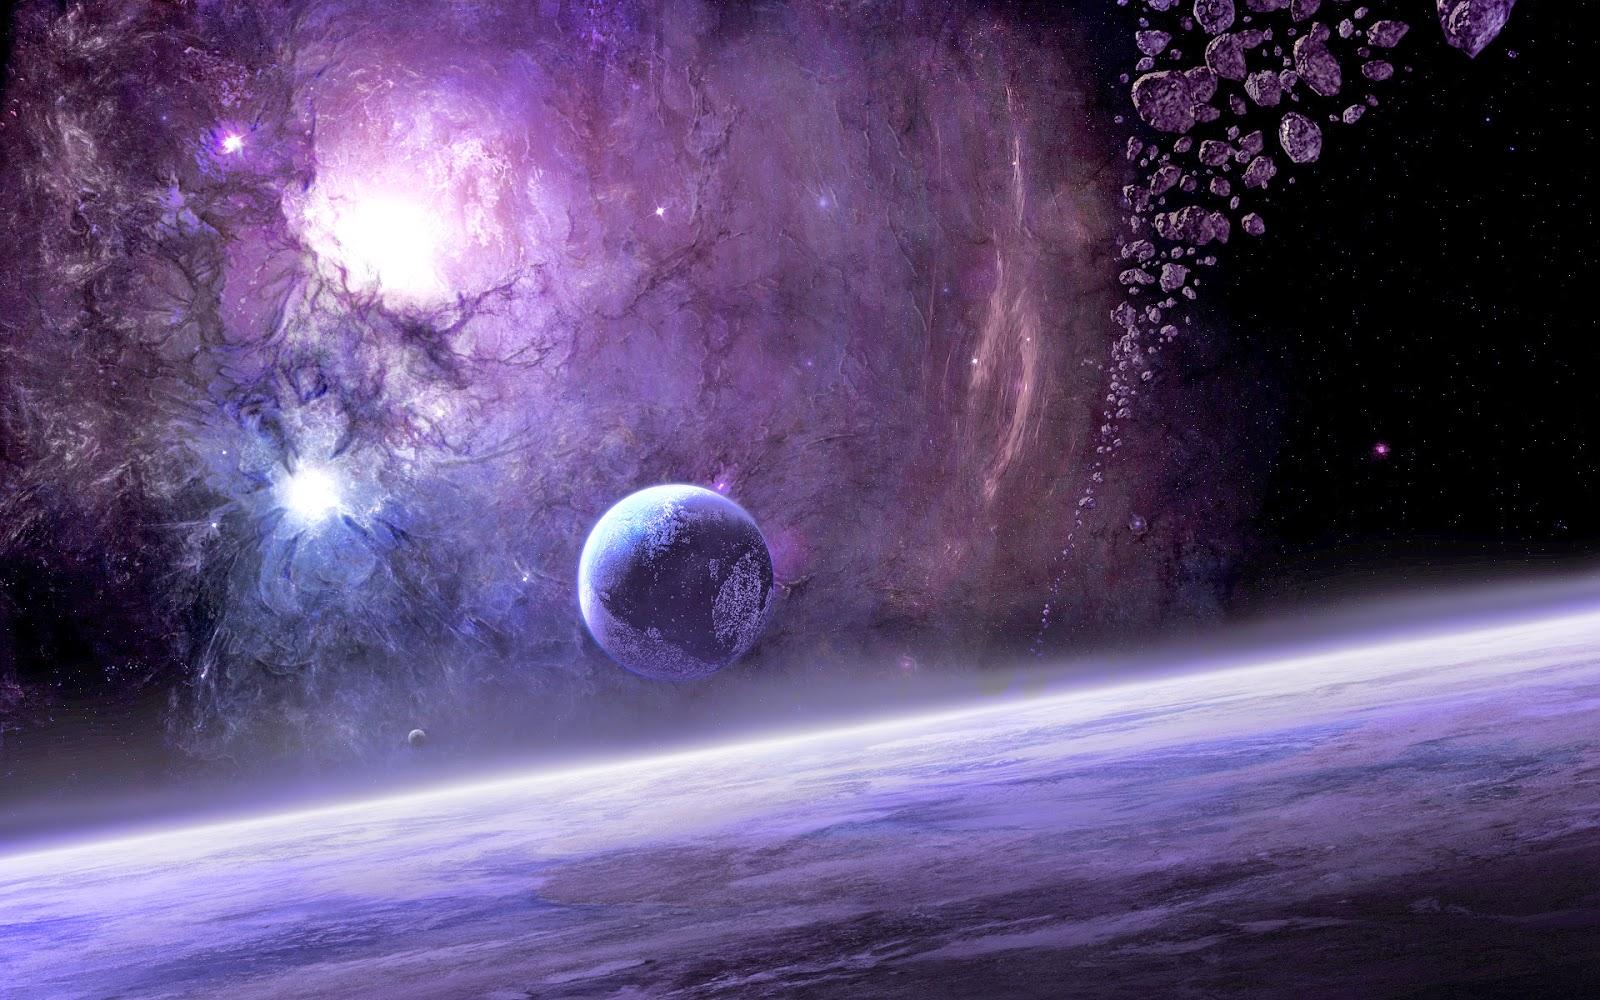 Galaxy Animasi Luar Angkasa